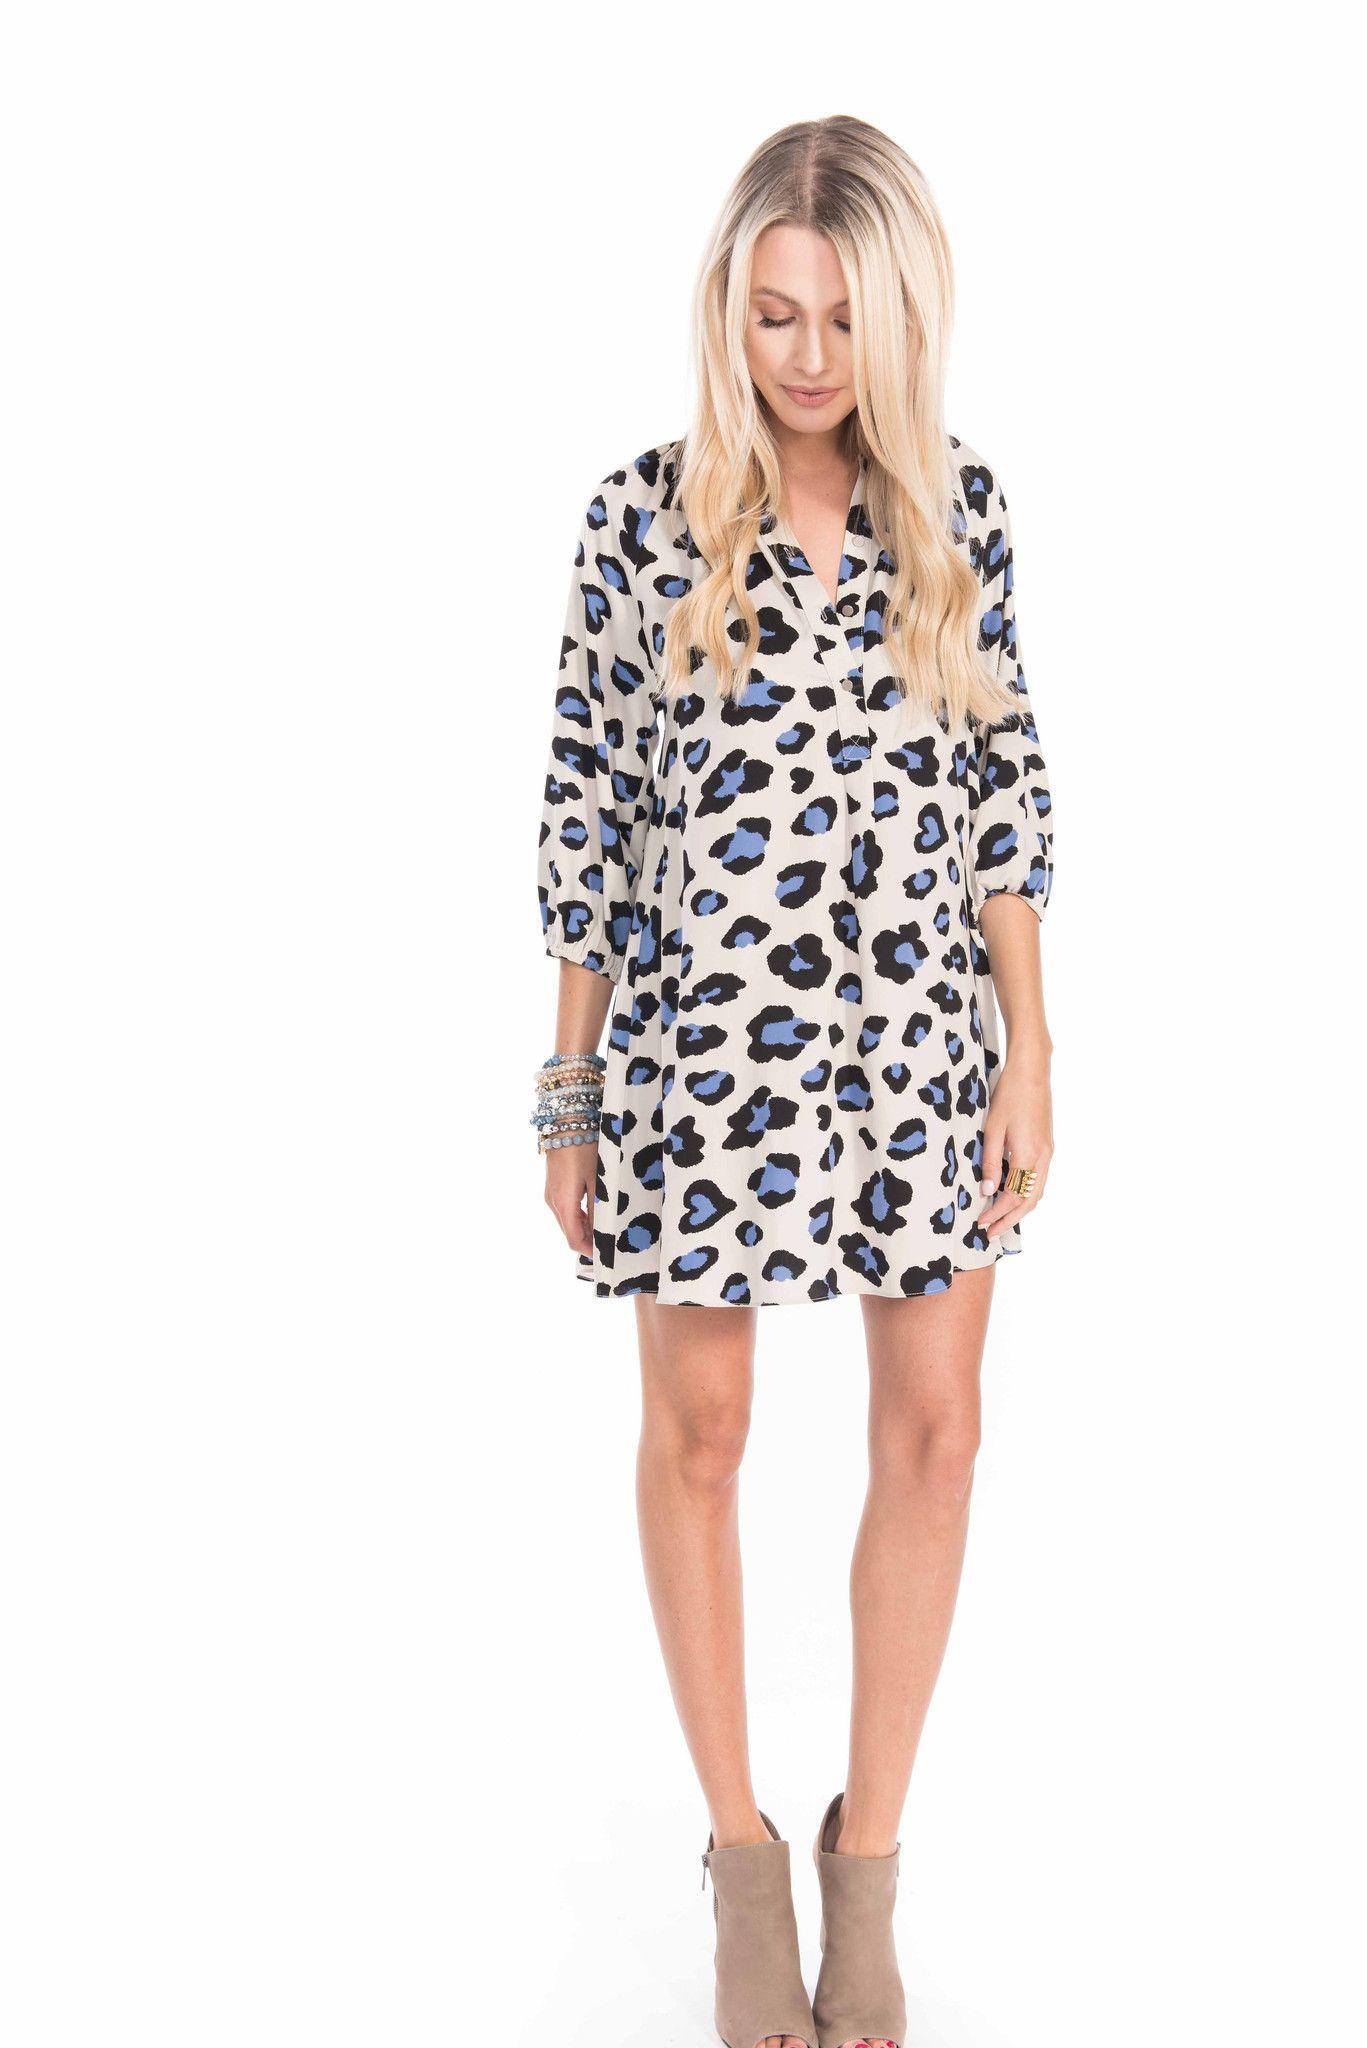 c97e1d5fefb Merida Powder Tunic Dress